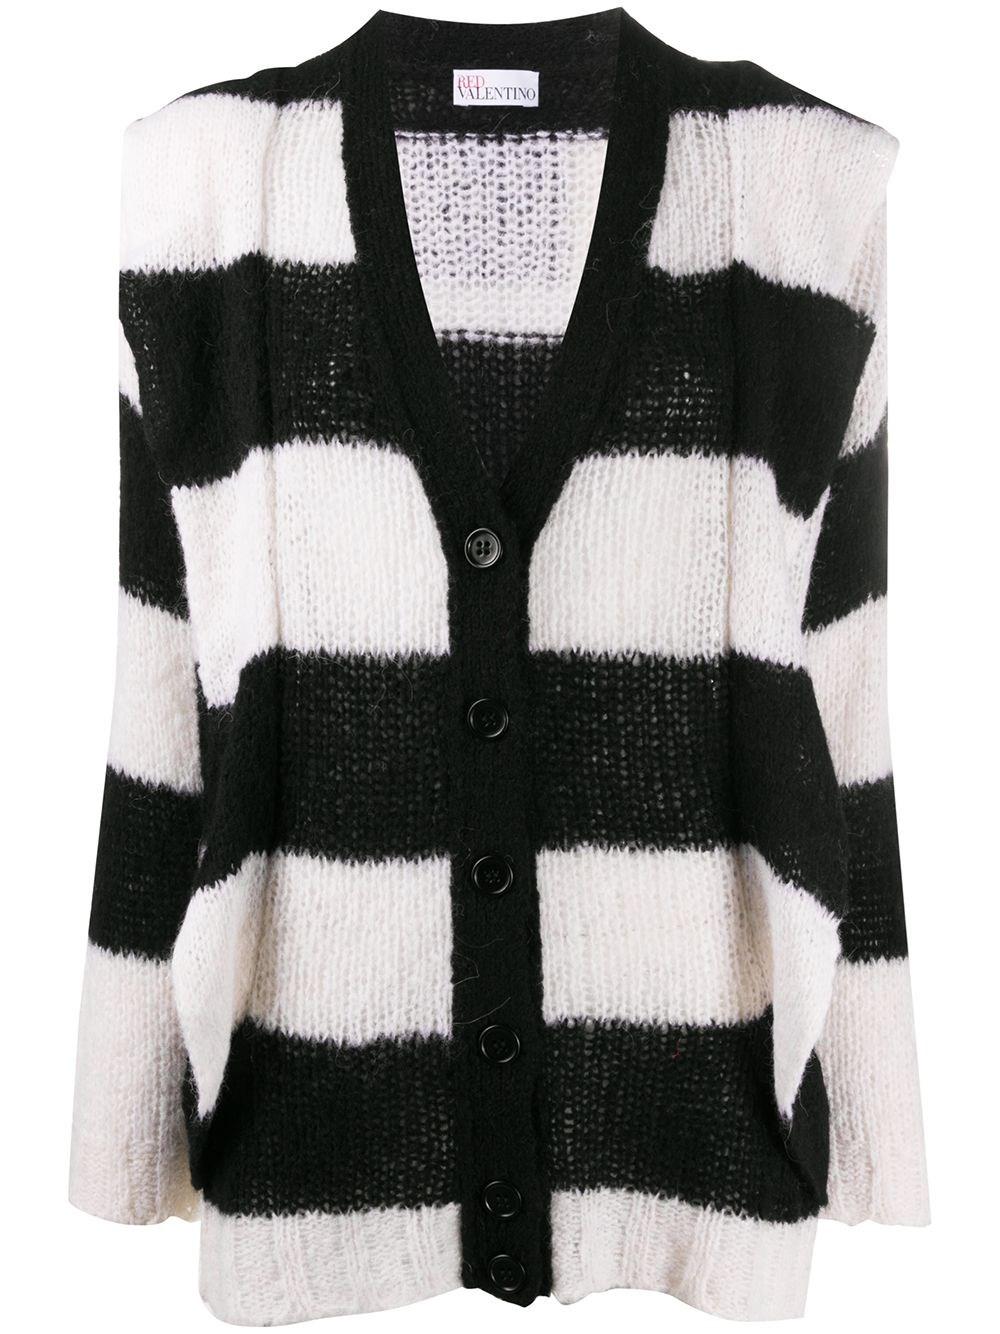 REDVALENTINO Striped Cardigan